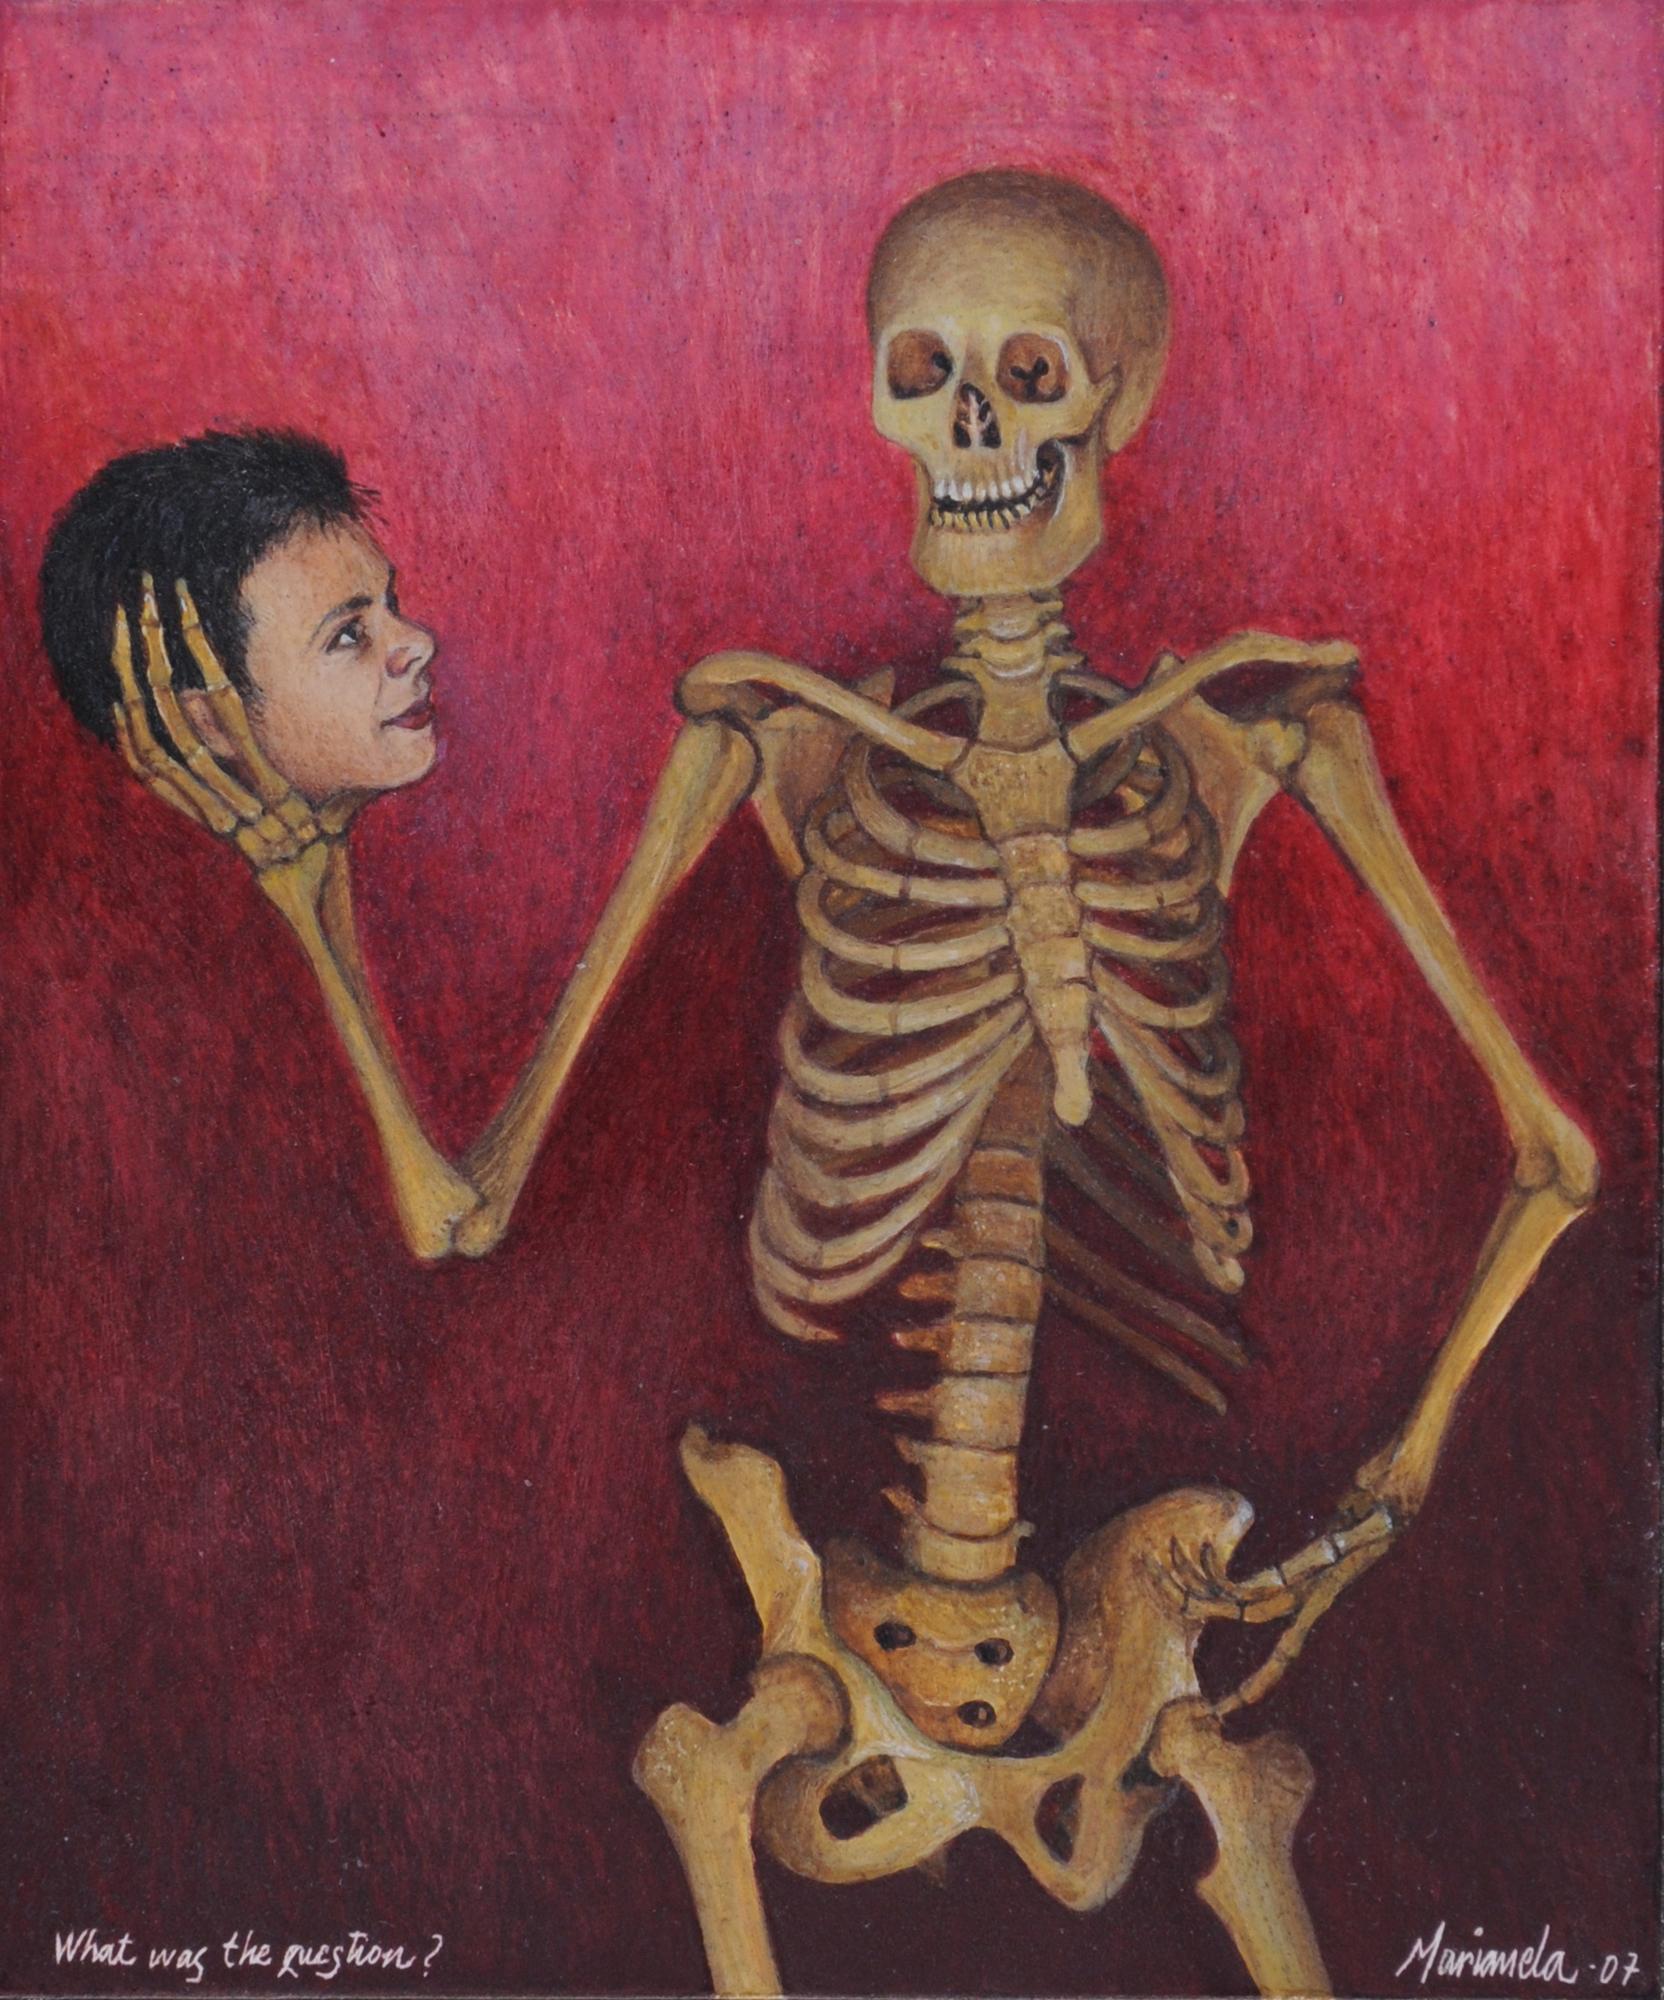 De la Hoz Marianela, 2 paintings: What Was the Question, 2007; Saturno junior devorando a sus padres, 2008.